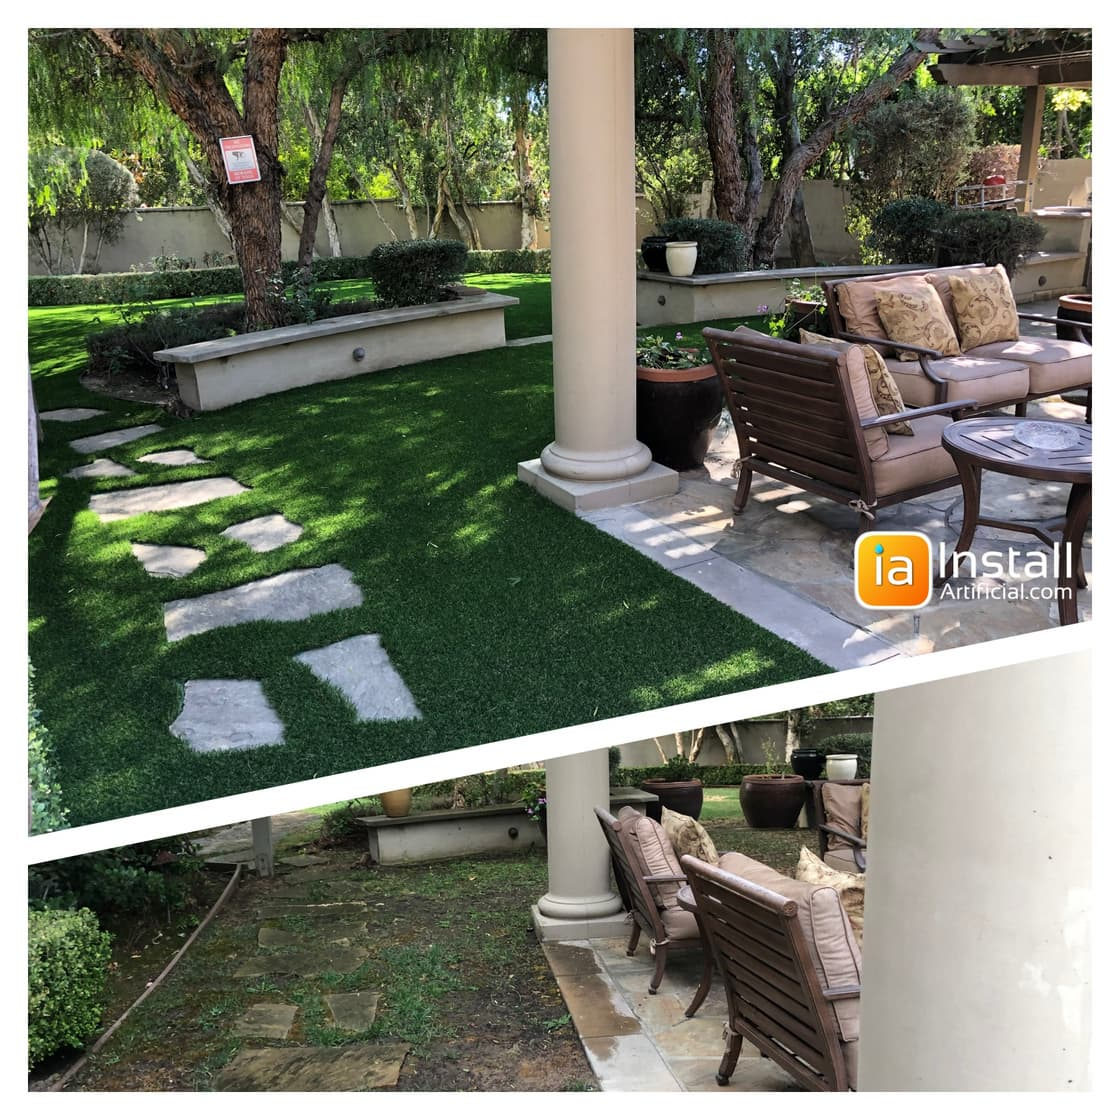 patio renovation with artificial grass Pasadena Sierra Madre